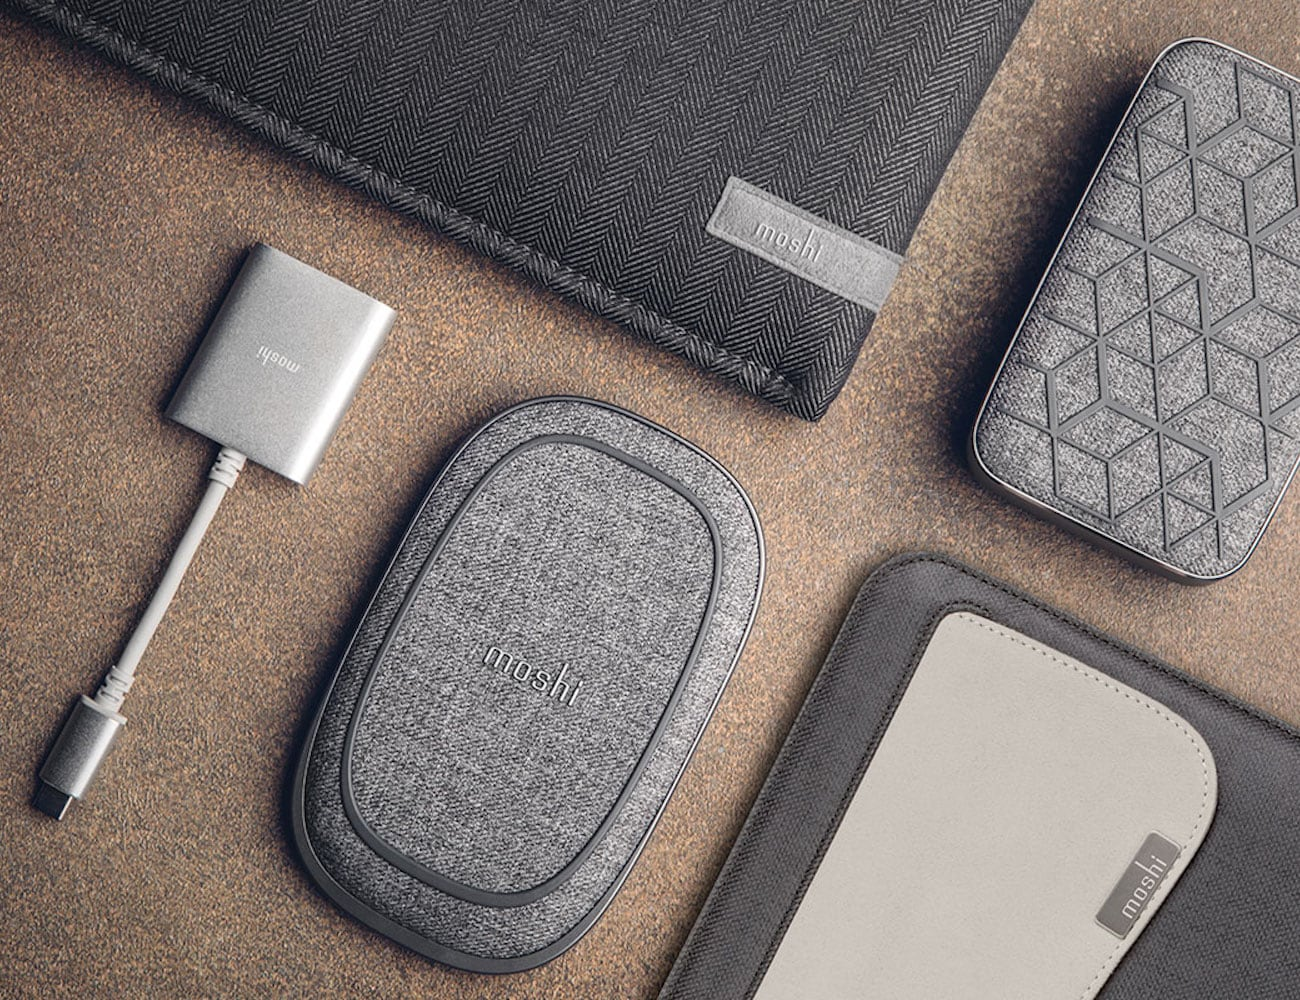 Moshi Porto Q 5K Stylish Portable Battery